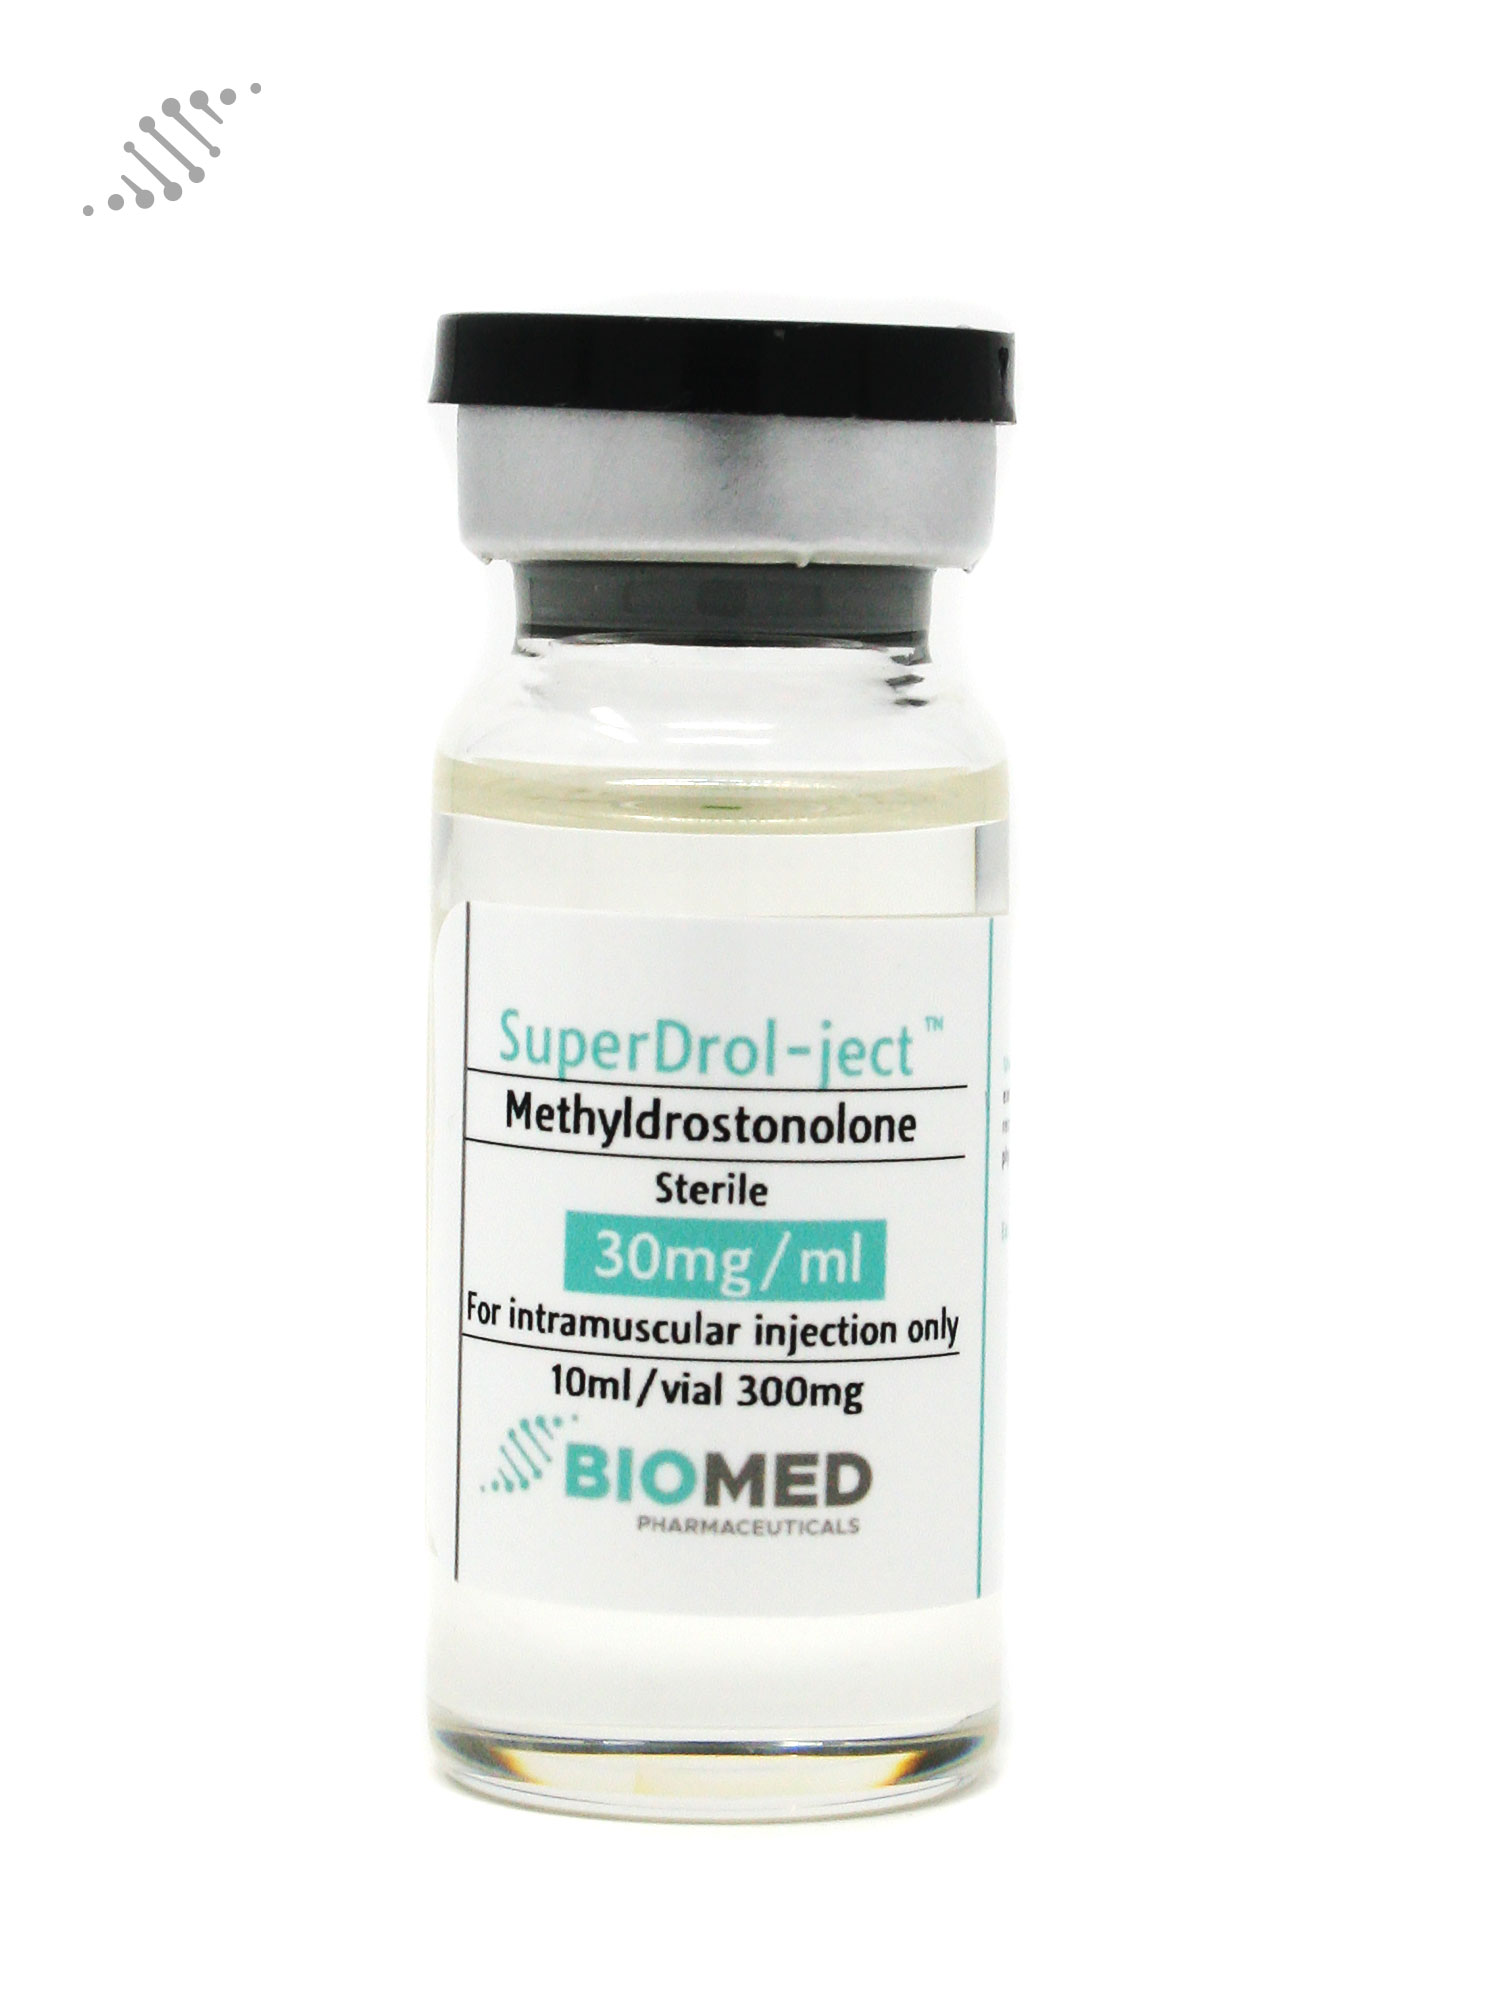 SuperDrol-ject Methyldrostonolone 30ml